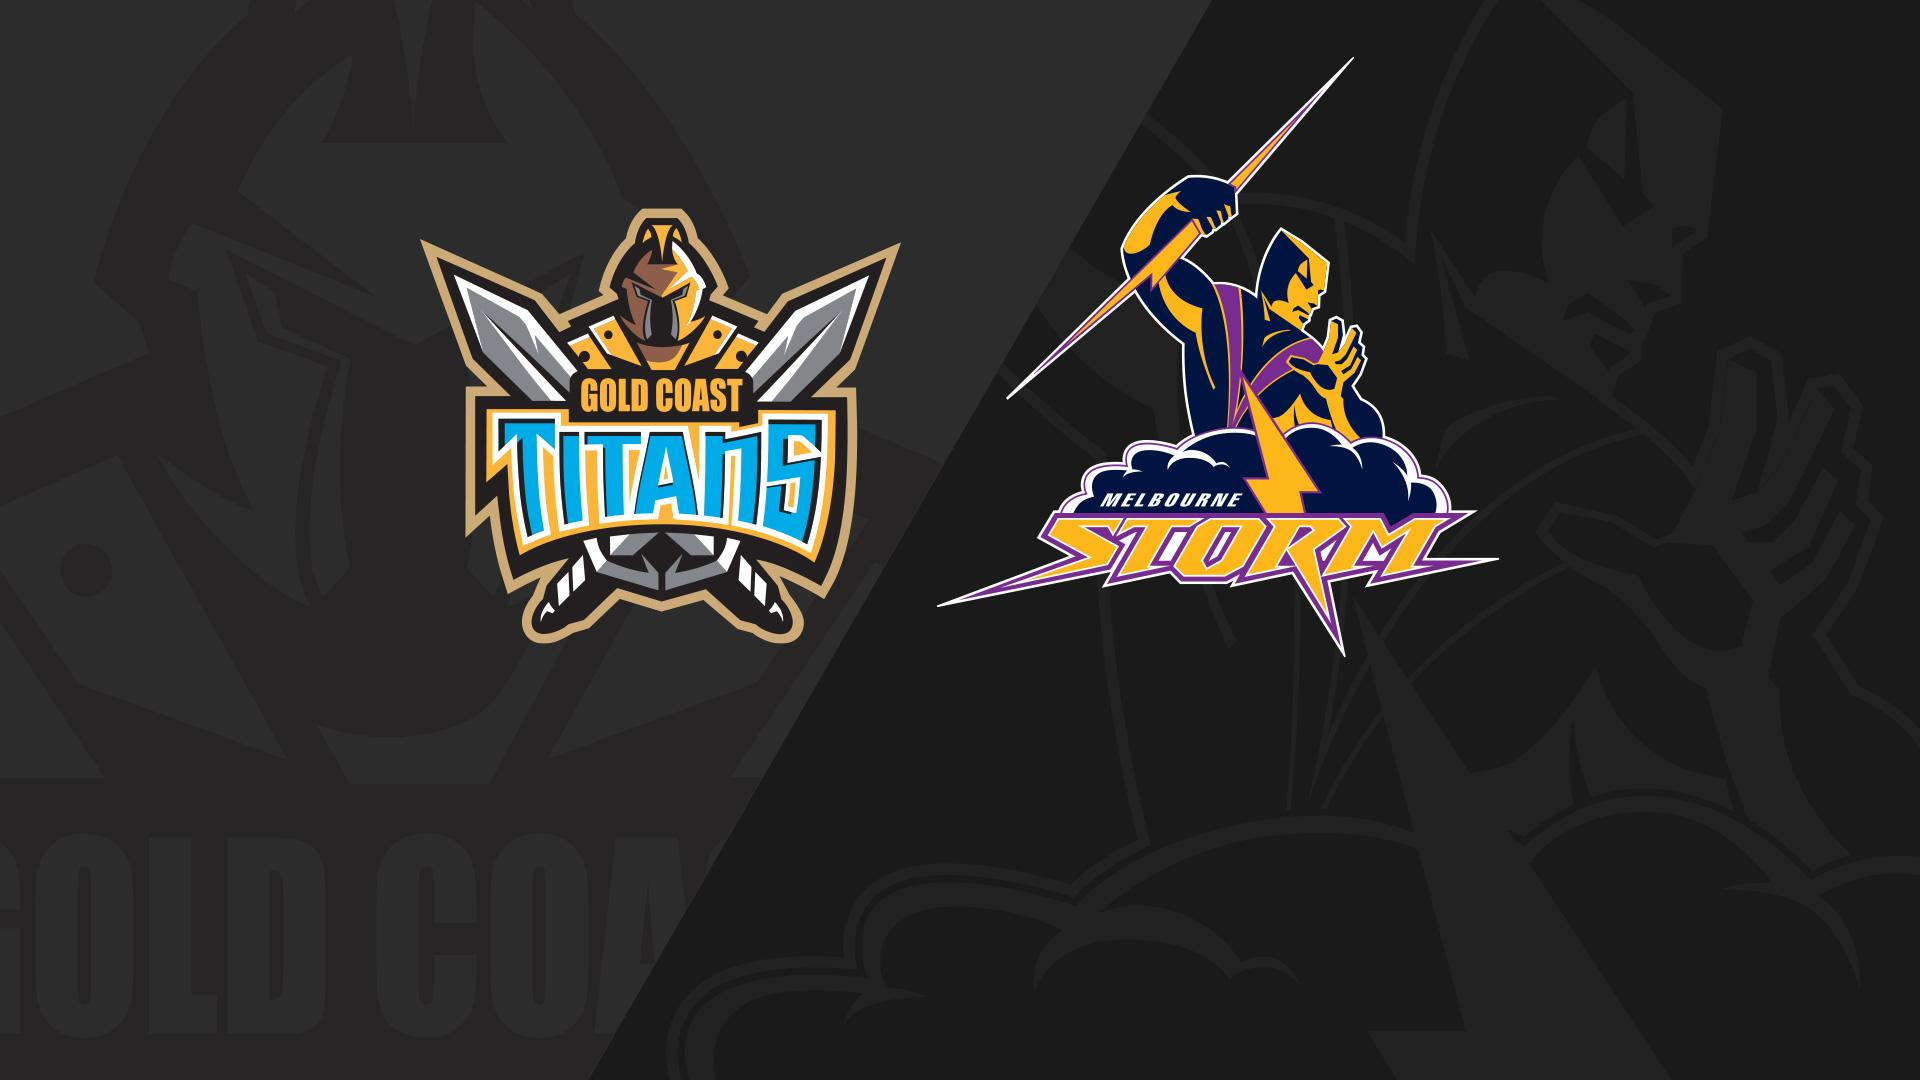 Full Match Replay: Titans v Storm - Round 24, 2018